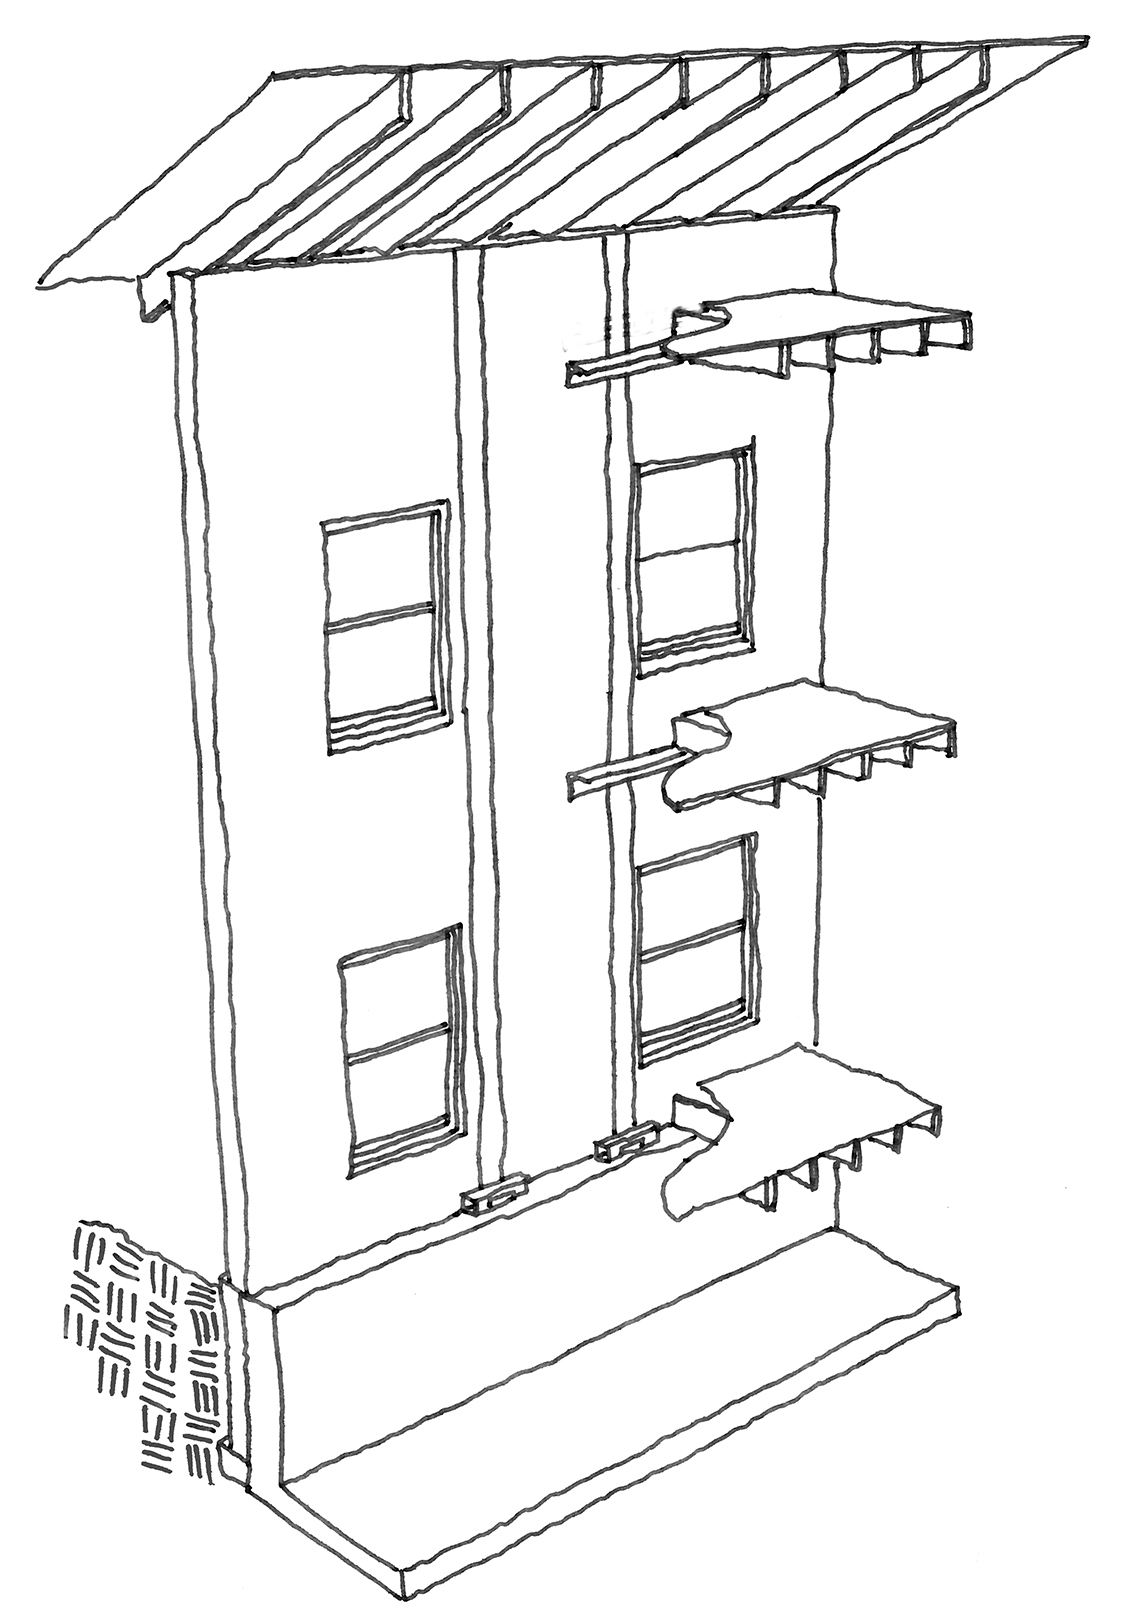 Presidio strengthening diagram